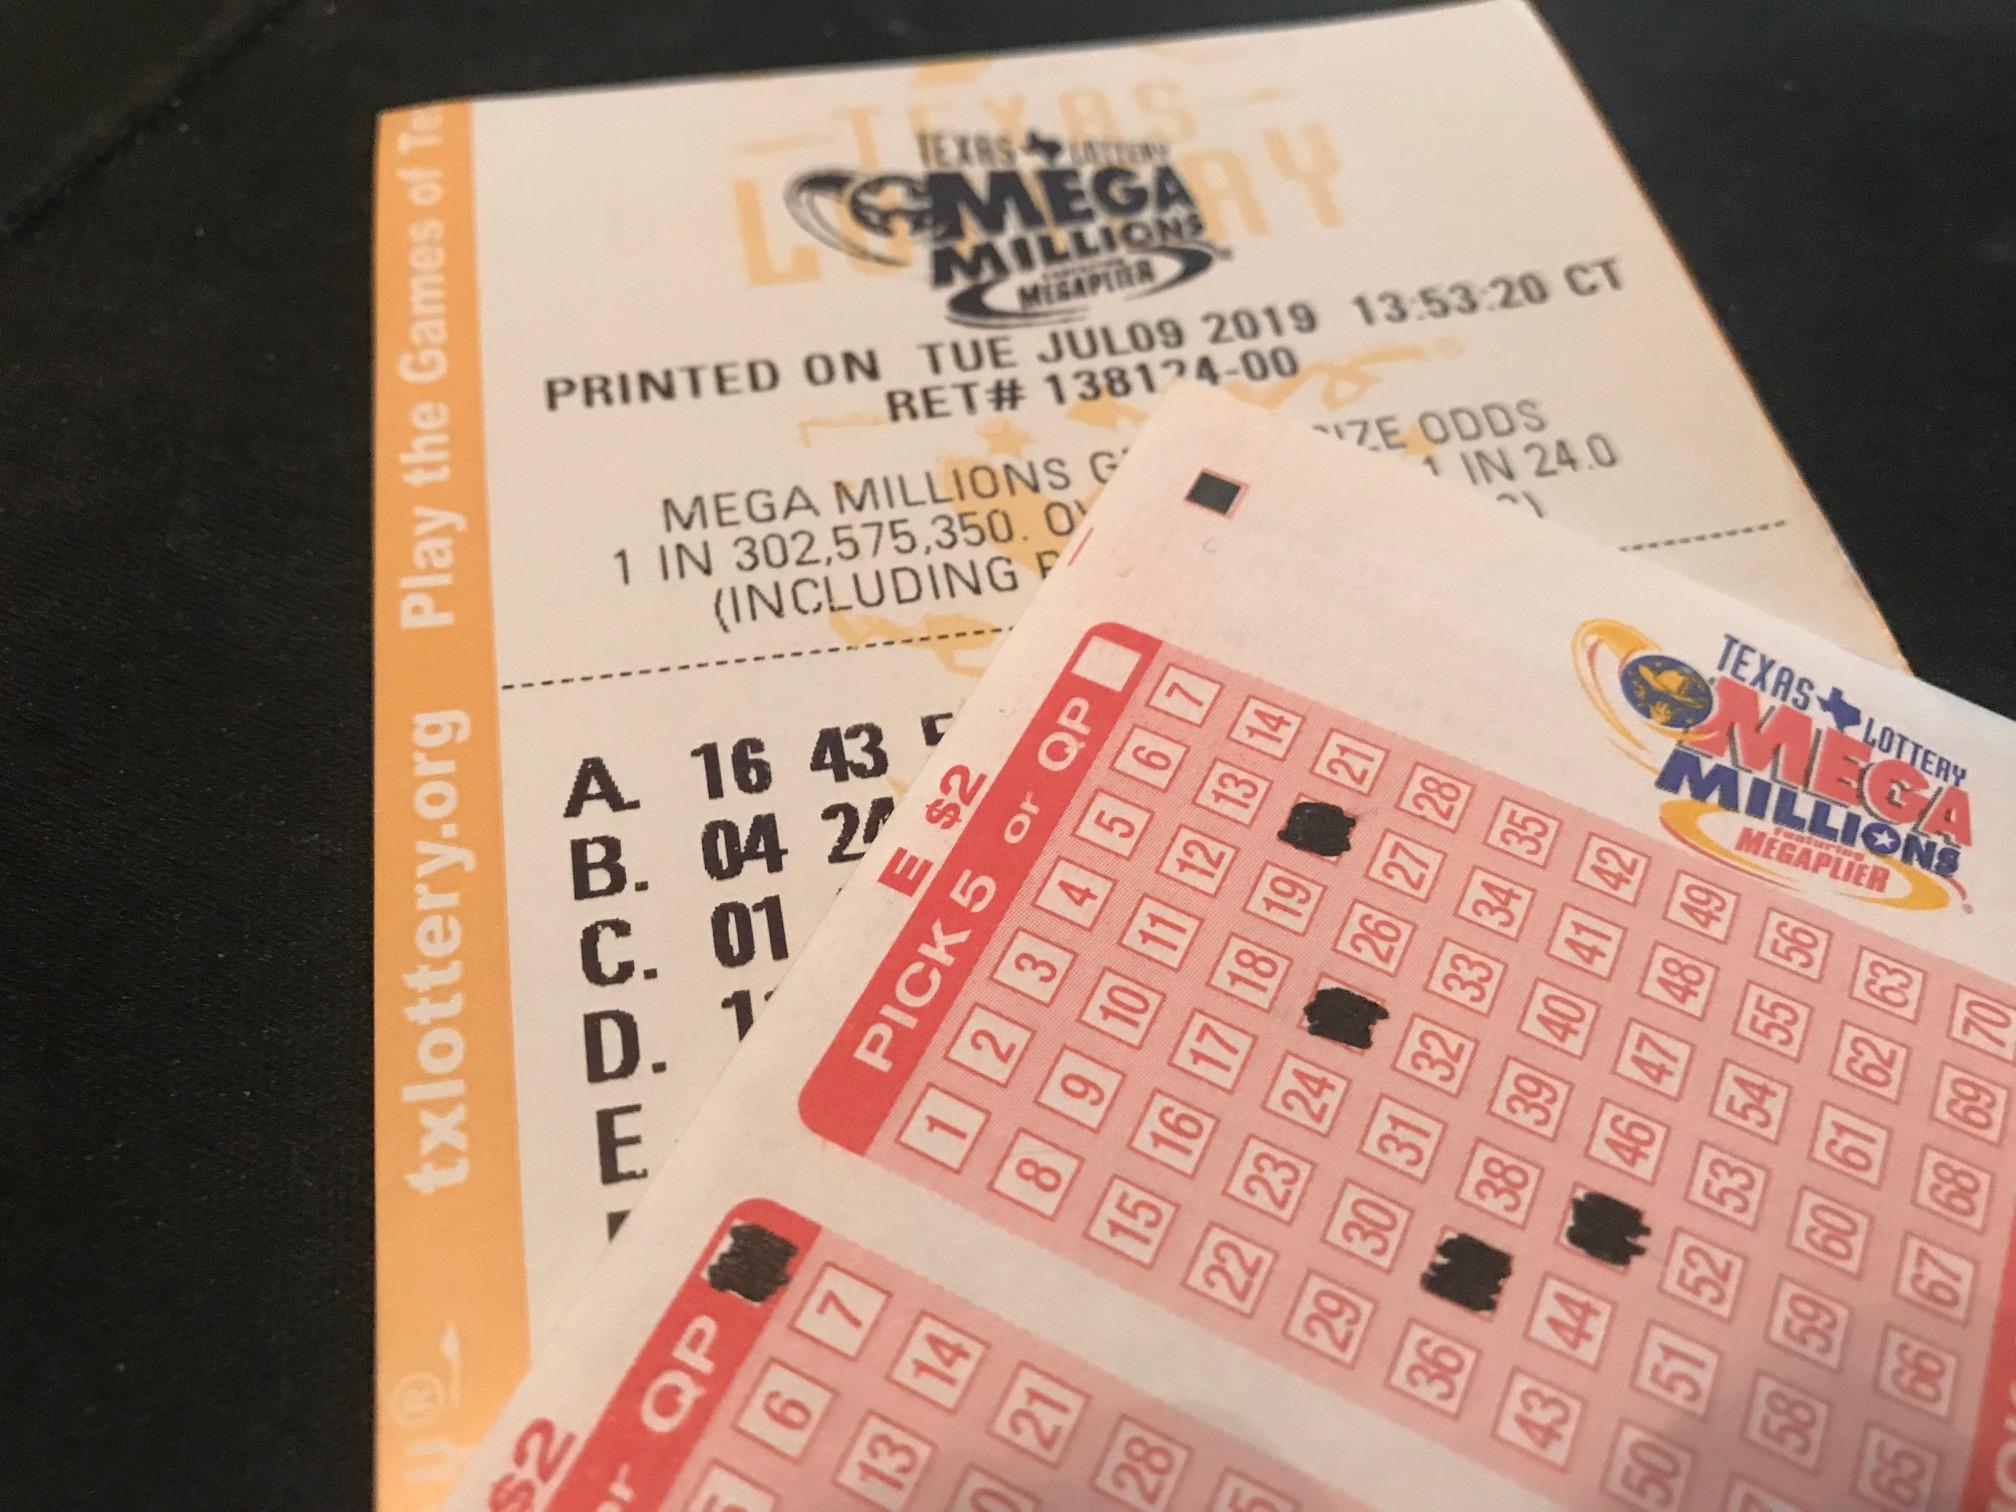 Mega Millions Numbers For 07 12 19 Friday Jackpot Is 121 Million